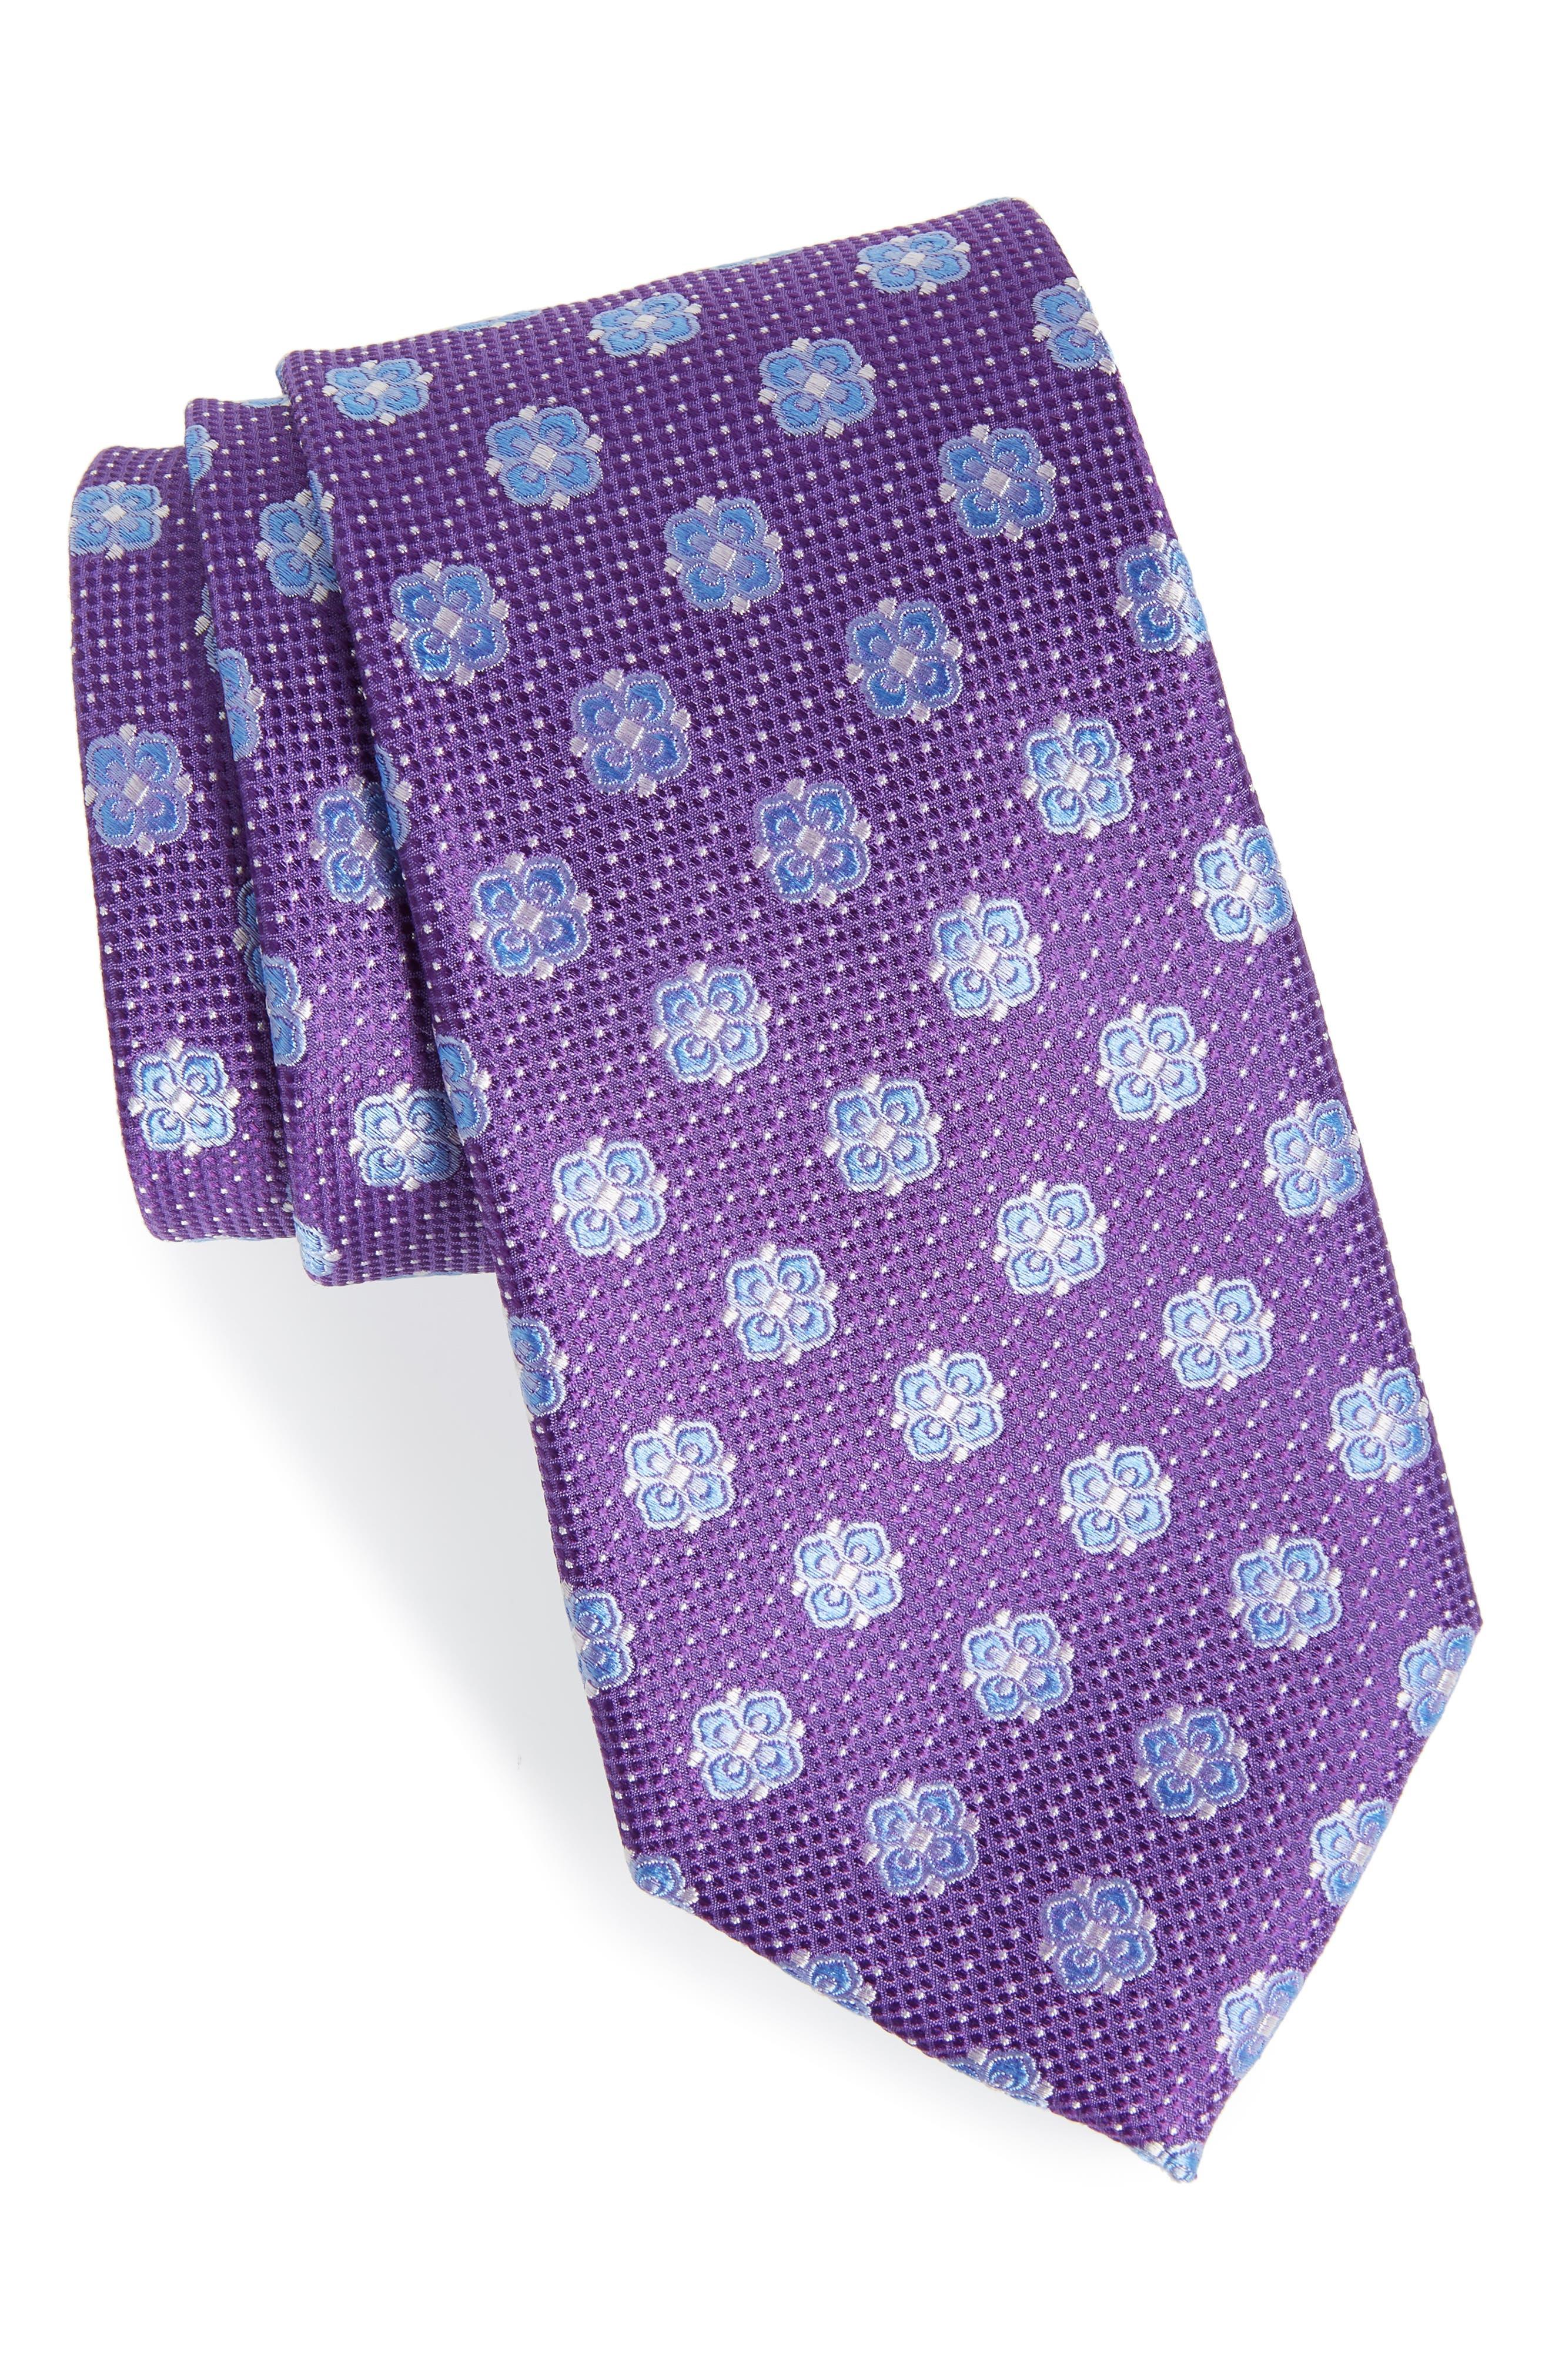 Matteo Floral Silk Tie,                         Main,                         color, PURPLE